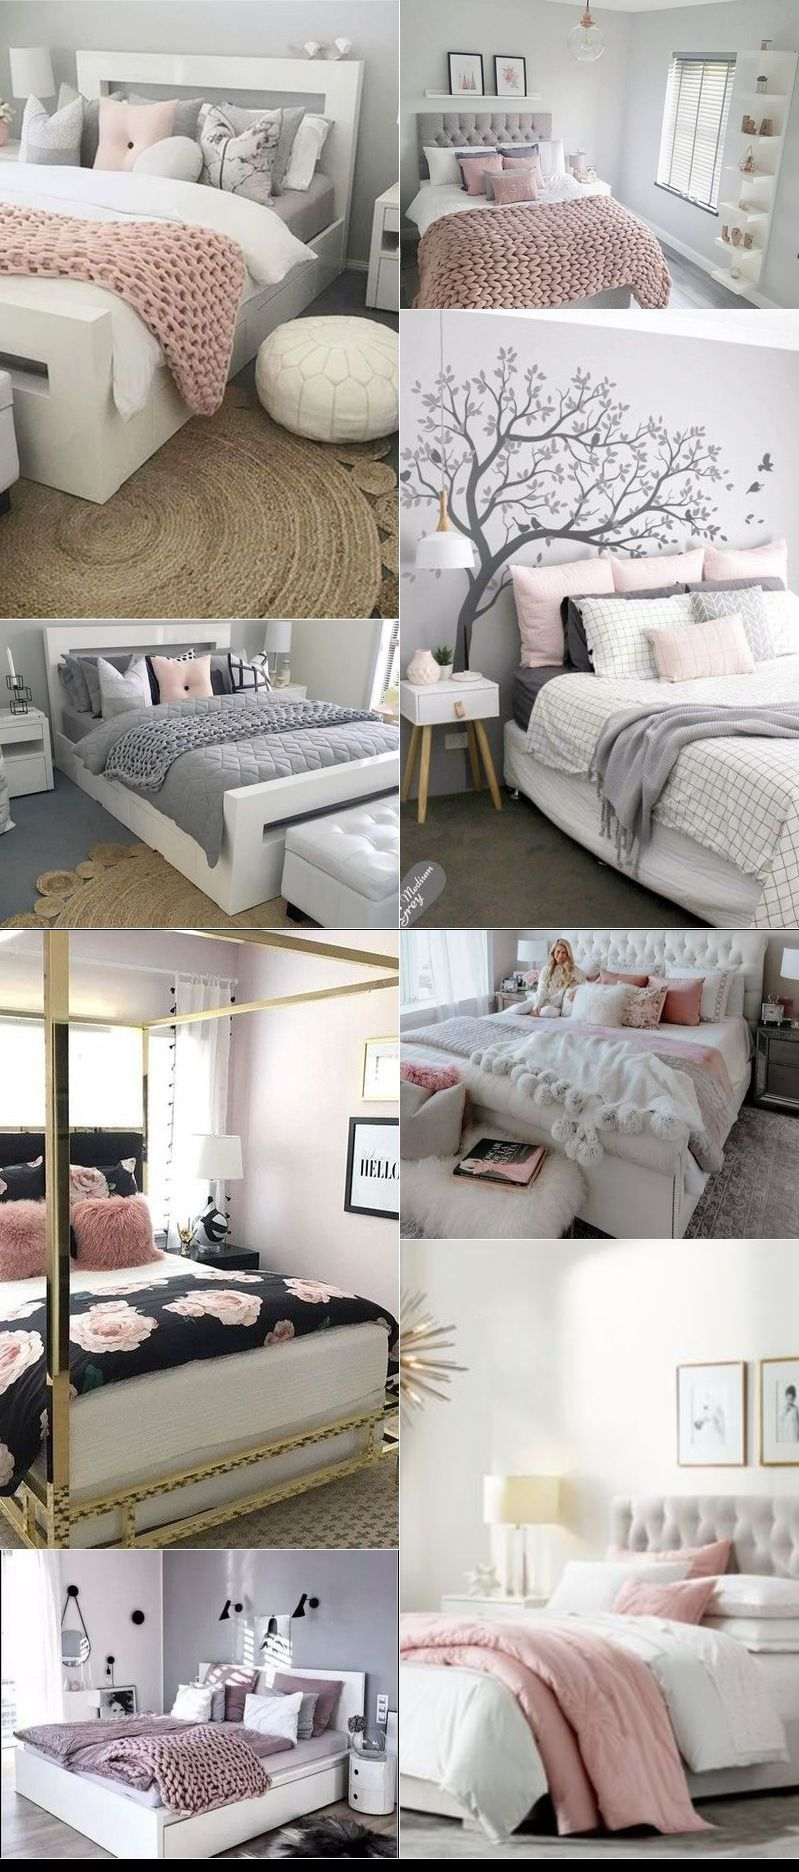 Blush Pink Bedroom Ideas Dusty Rose Bedroom Decor And Bedding I Love Rose Bedroom Dusty Pink Bedroom Blush Pink Bedroom